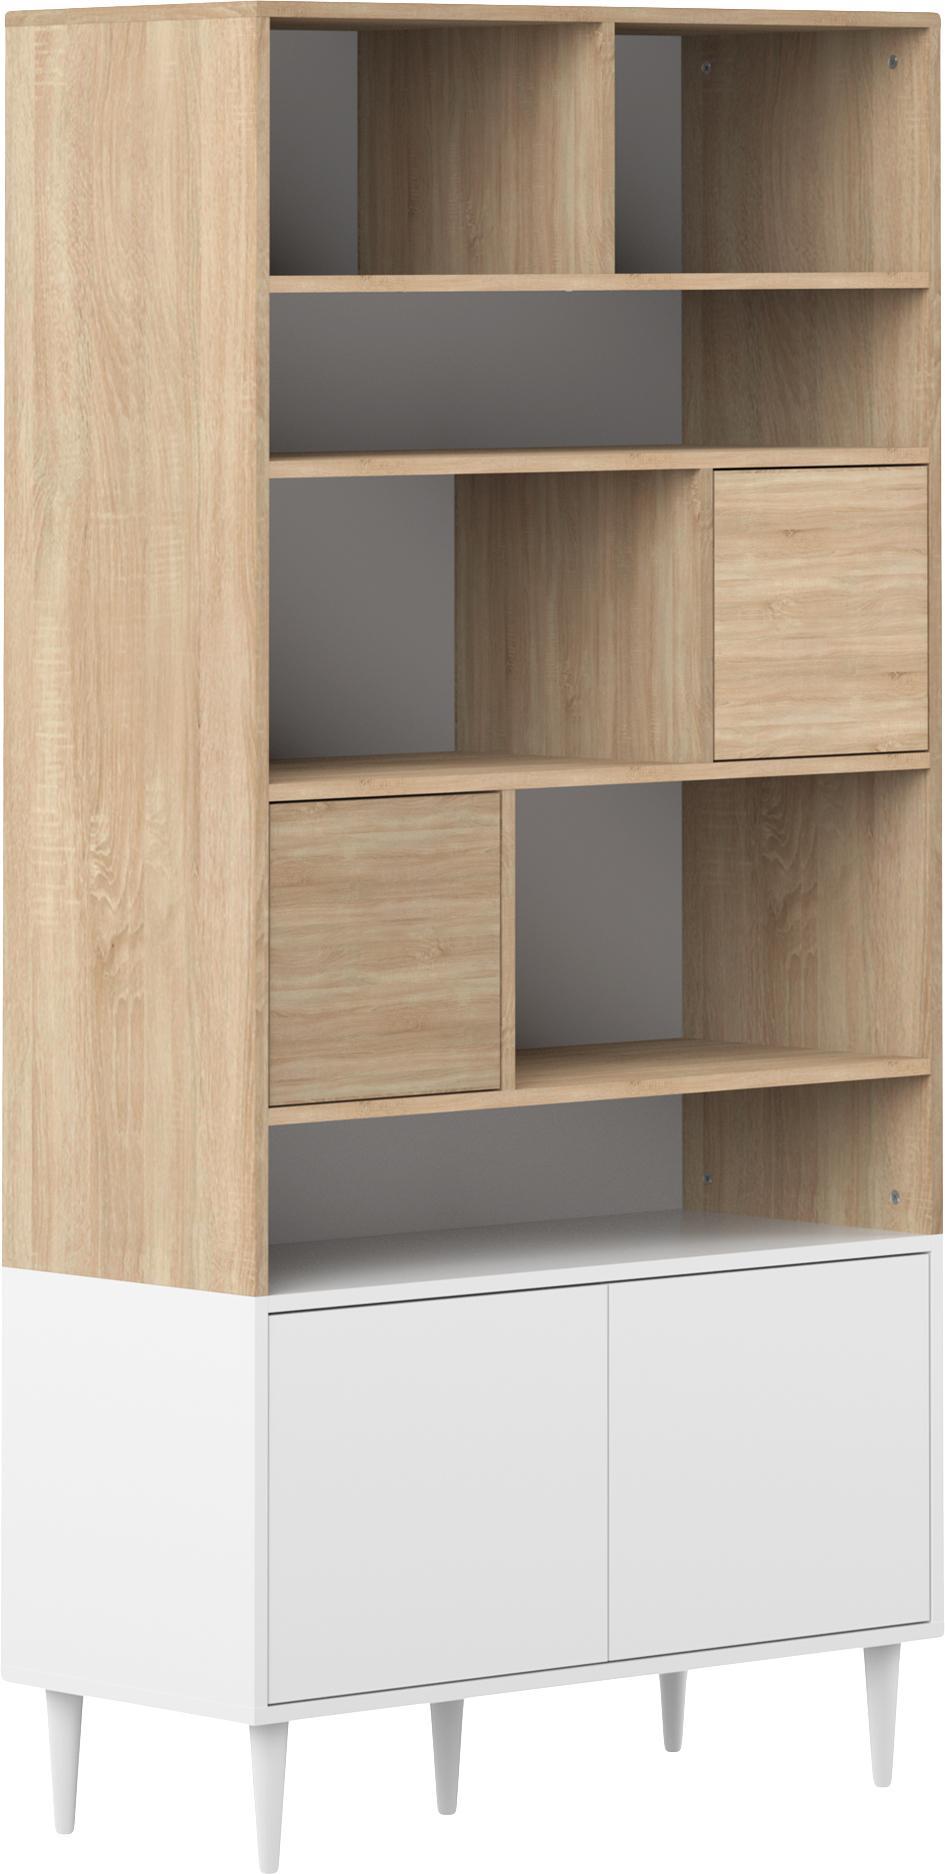 Standregal Horizon im Skandi Design, Korpus: Spanplatte, melaminbeschi, Eichenholz, Weiss, 90 x 180 cm